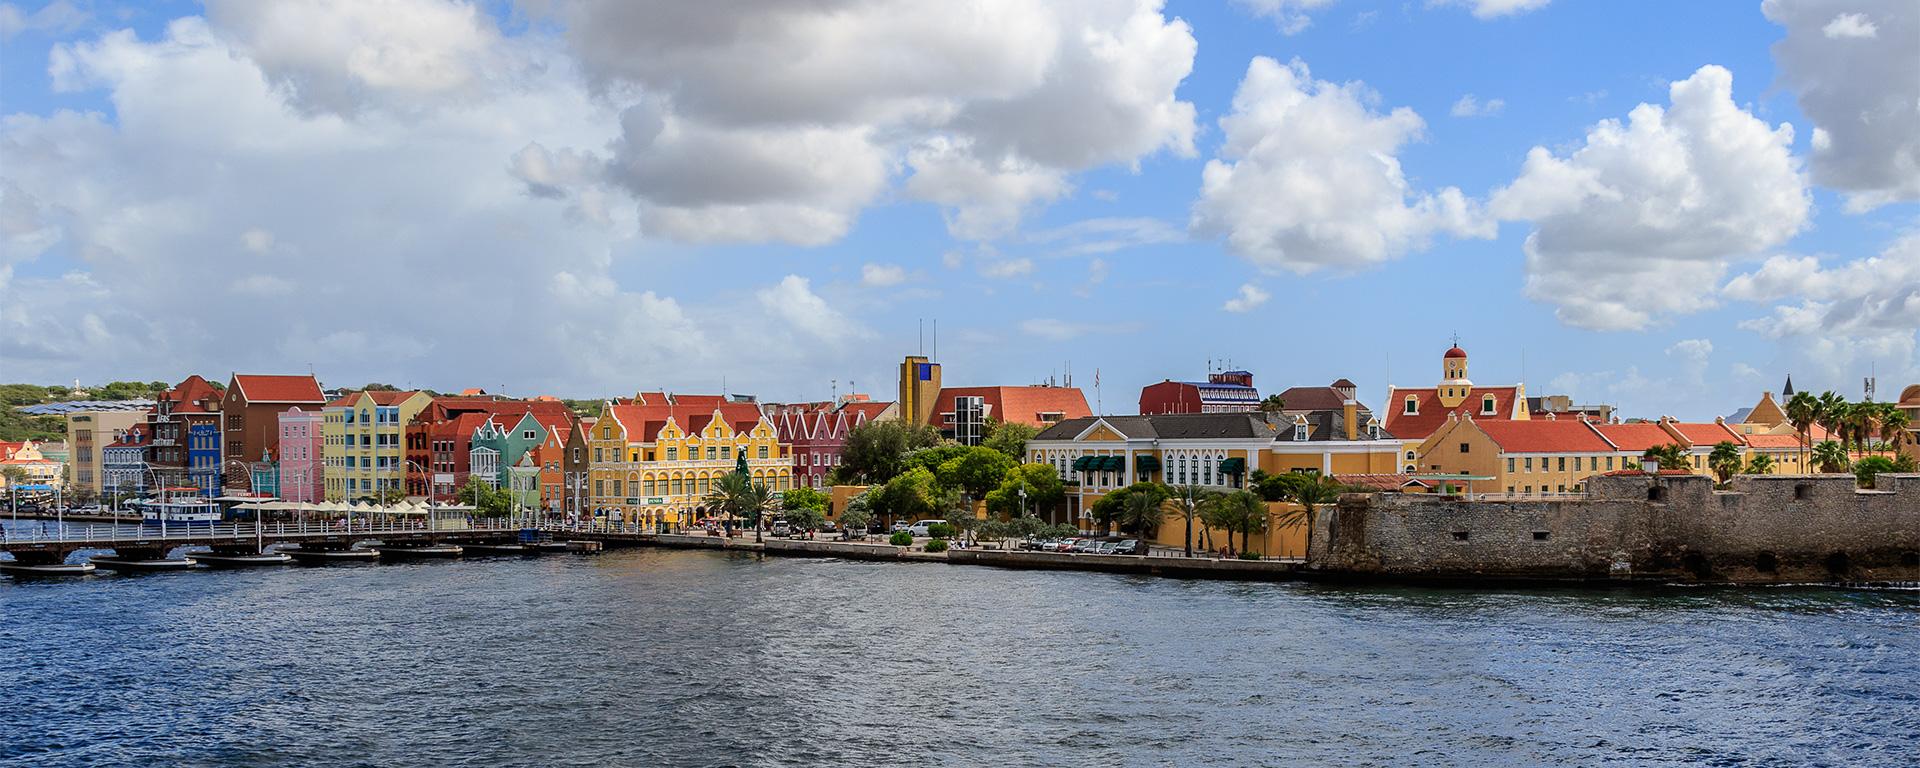 Willemstad (Curaçao)